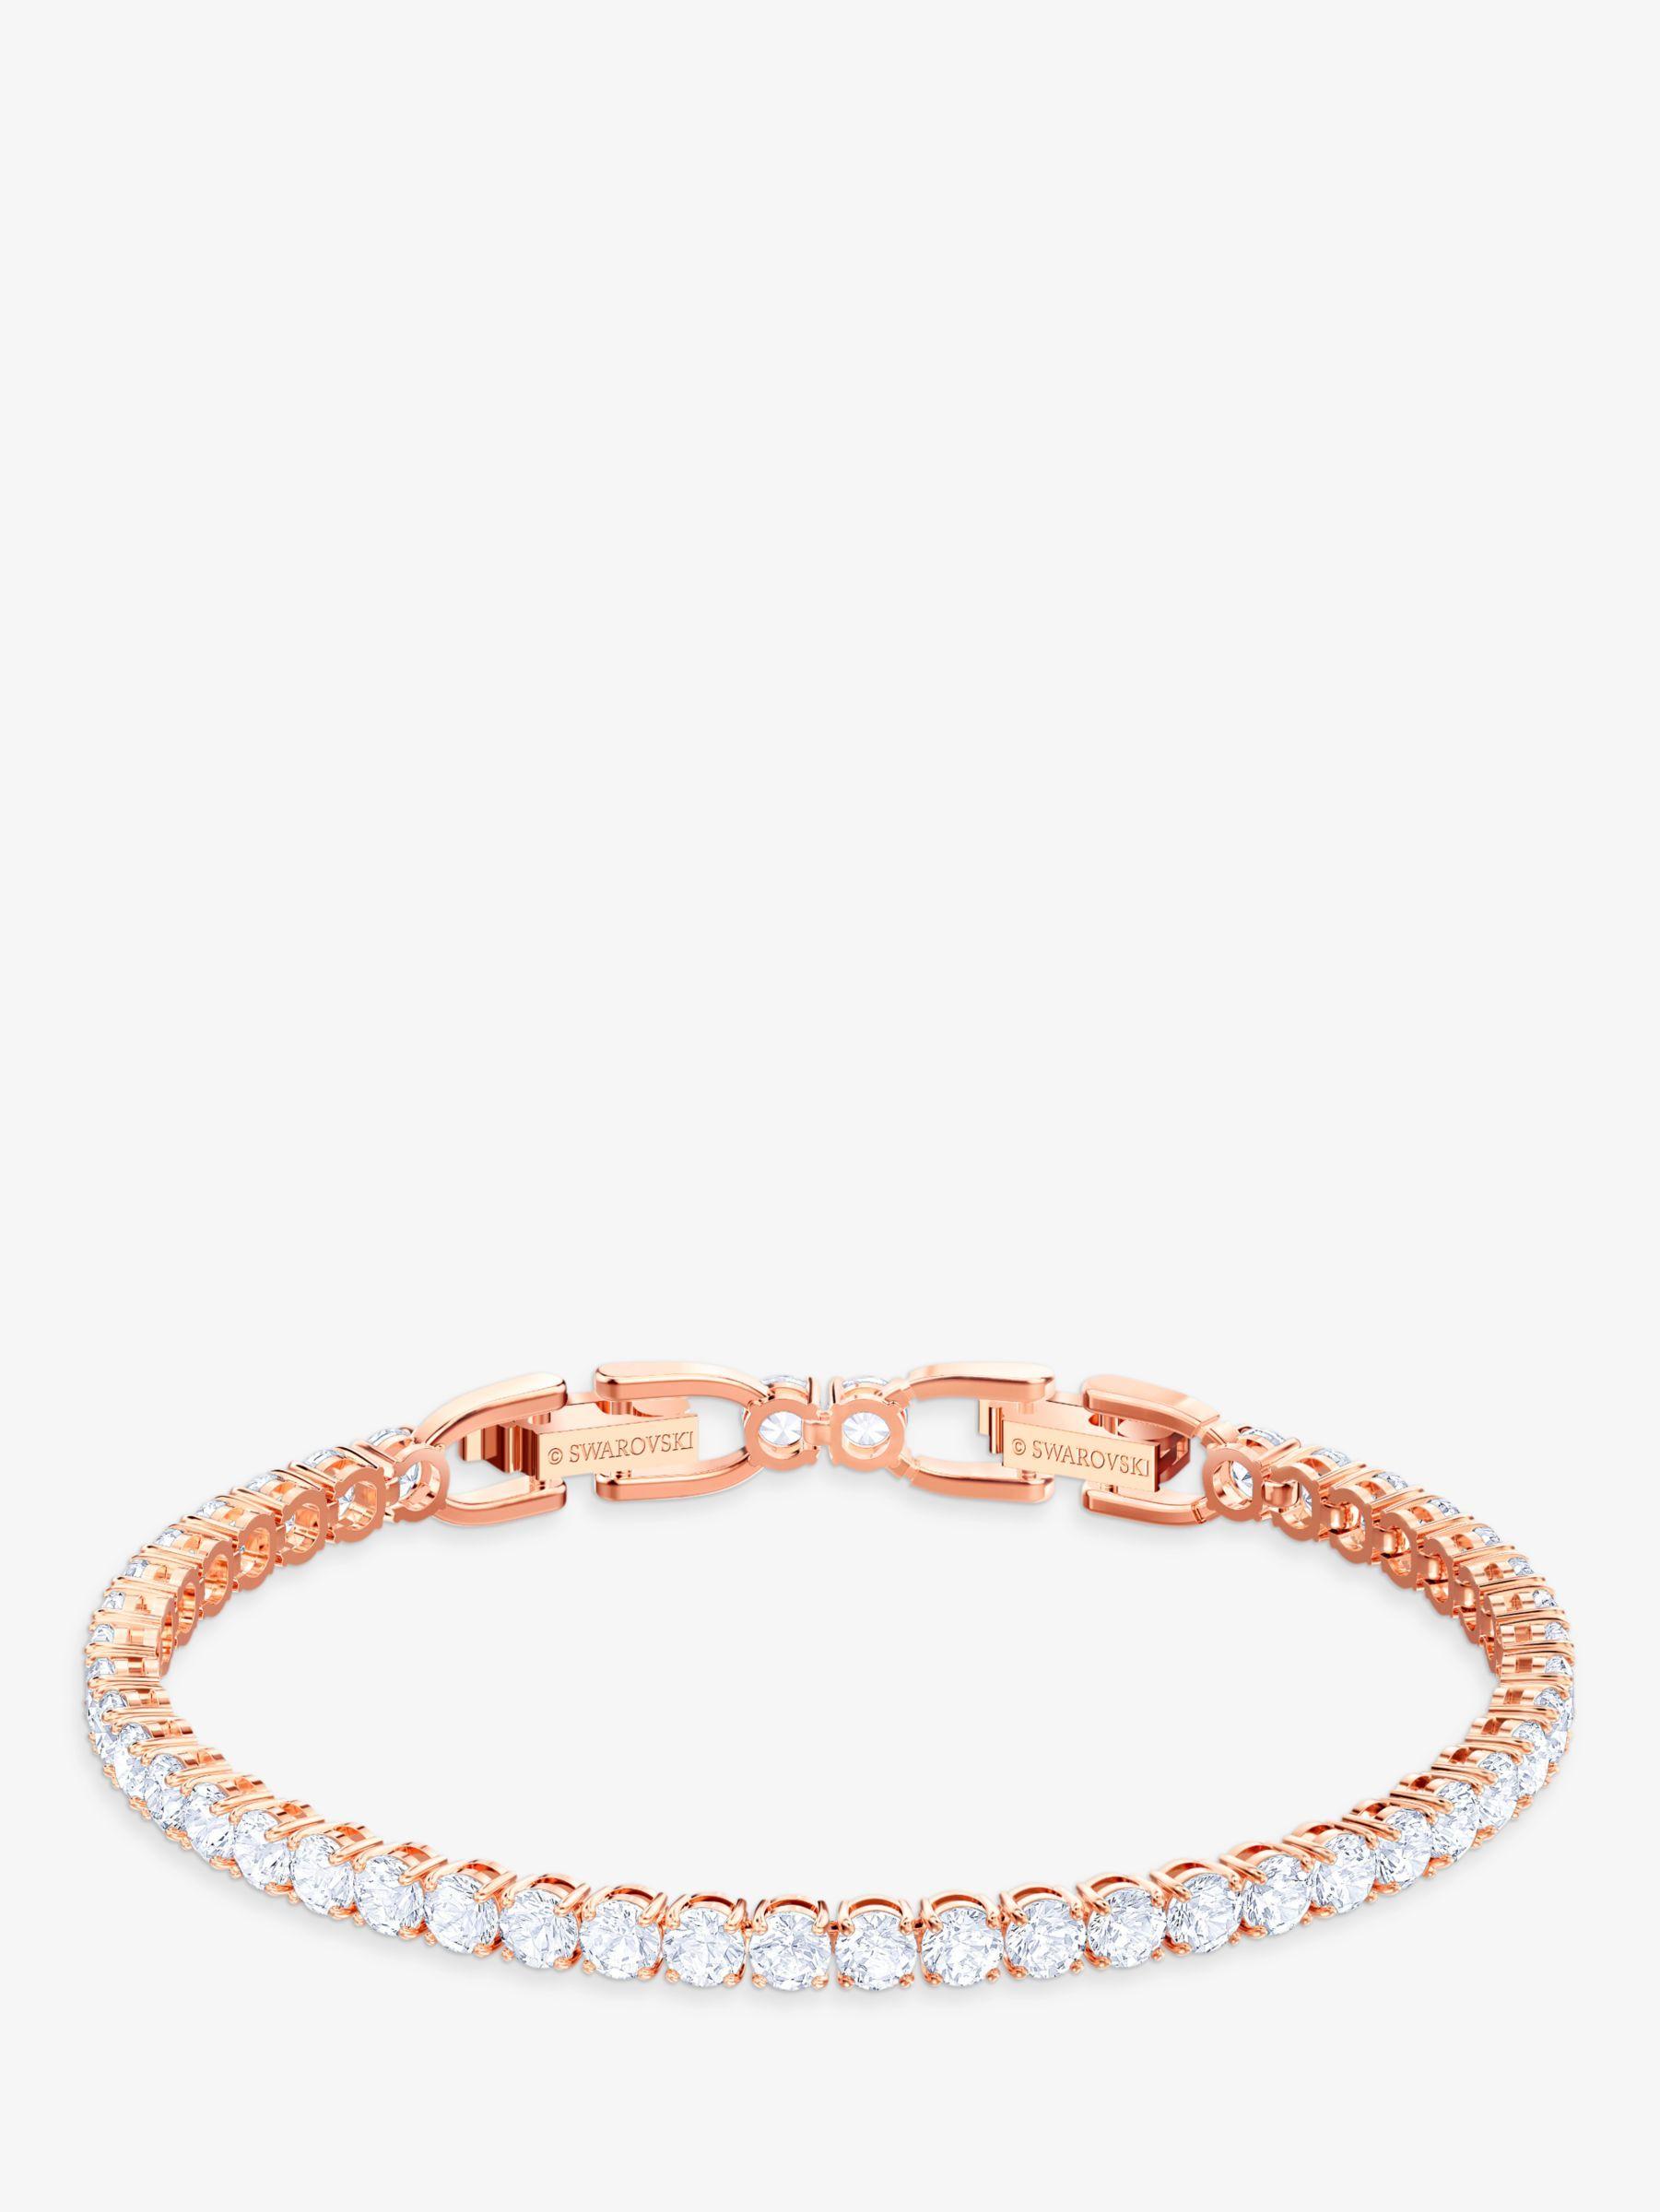 Swarovski Crystal Tennis Bracelet Silver Swarovski Crystals Swarovski Bracelets